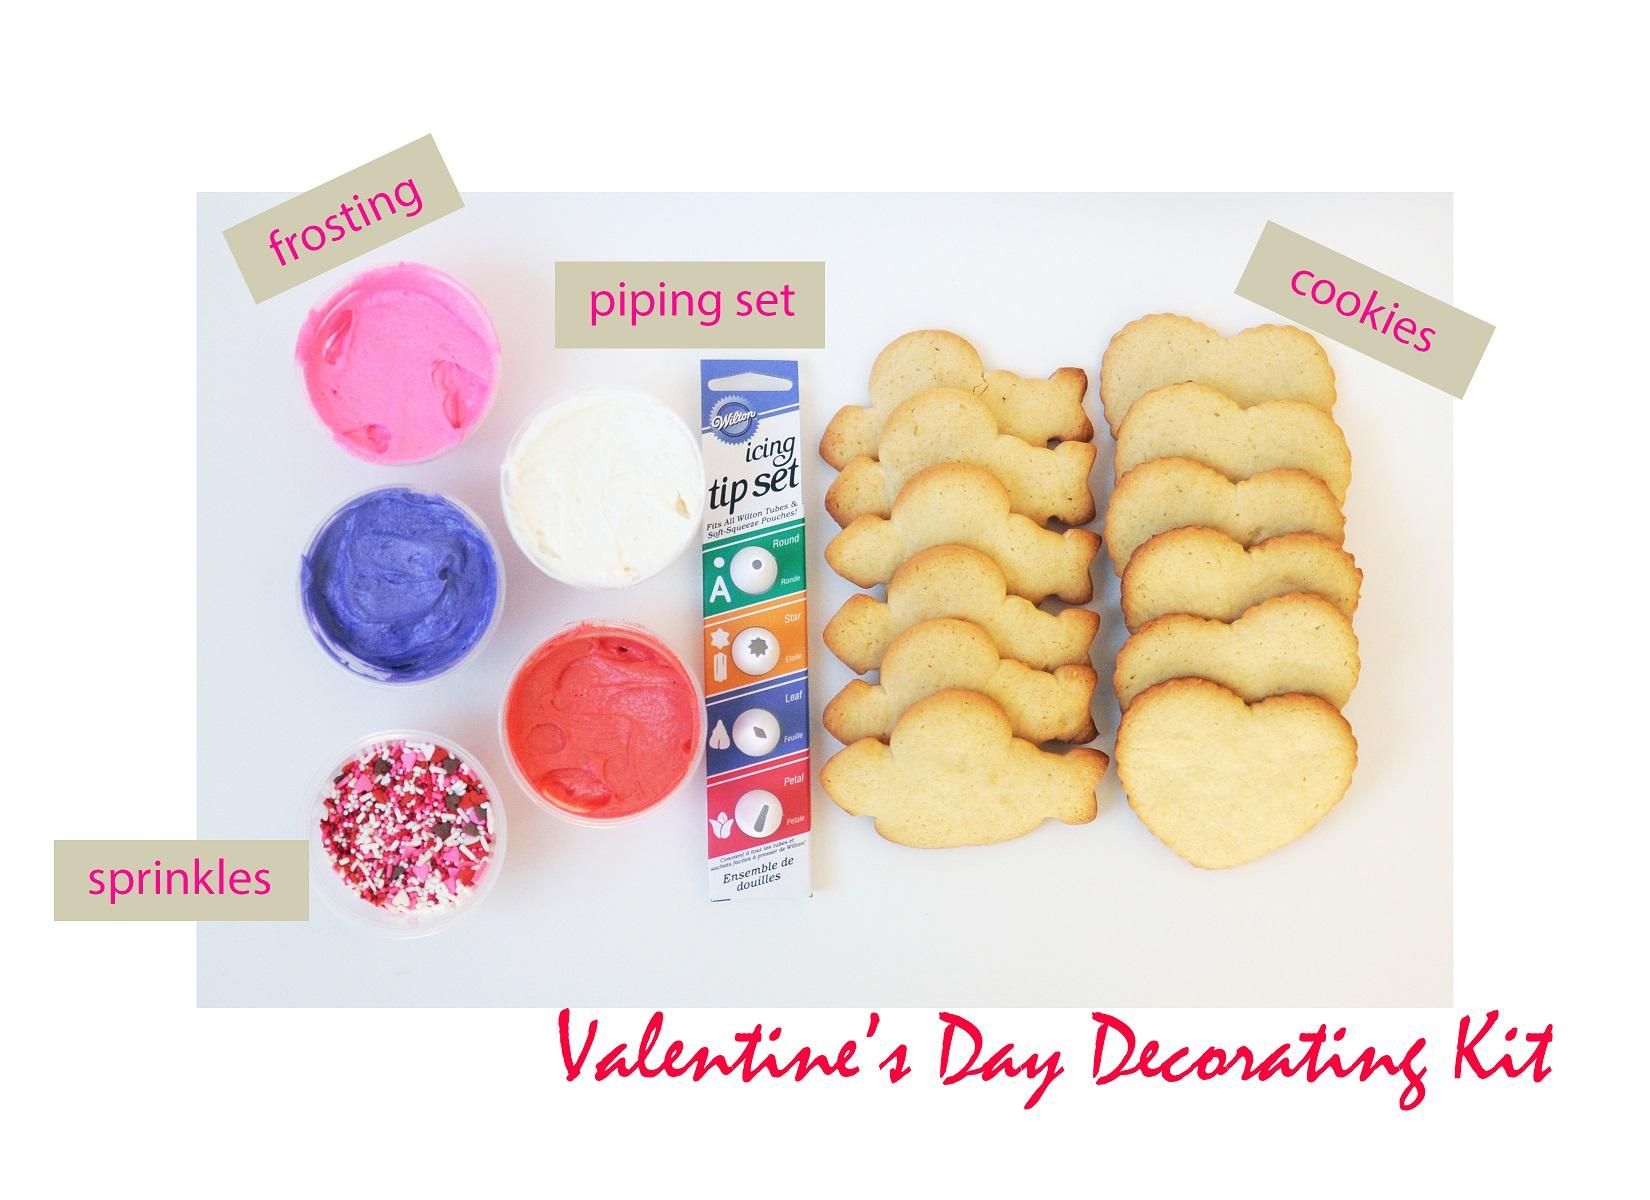 Hasmik's Valentines Day Decorating Kit